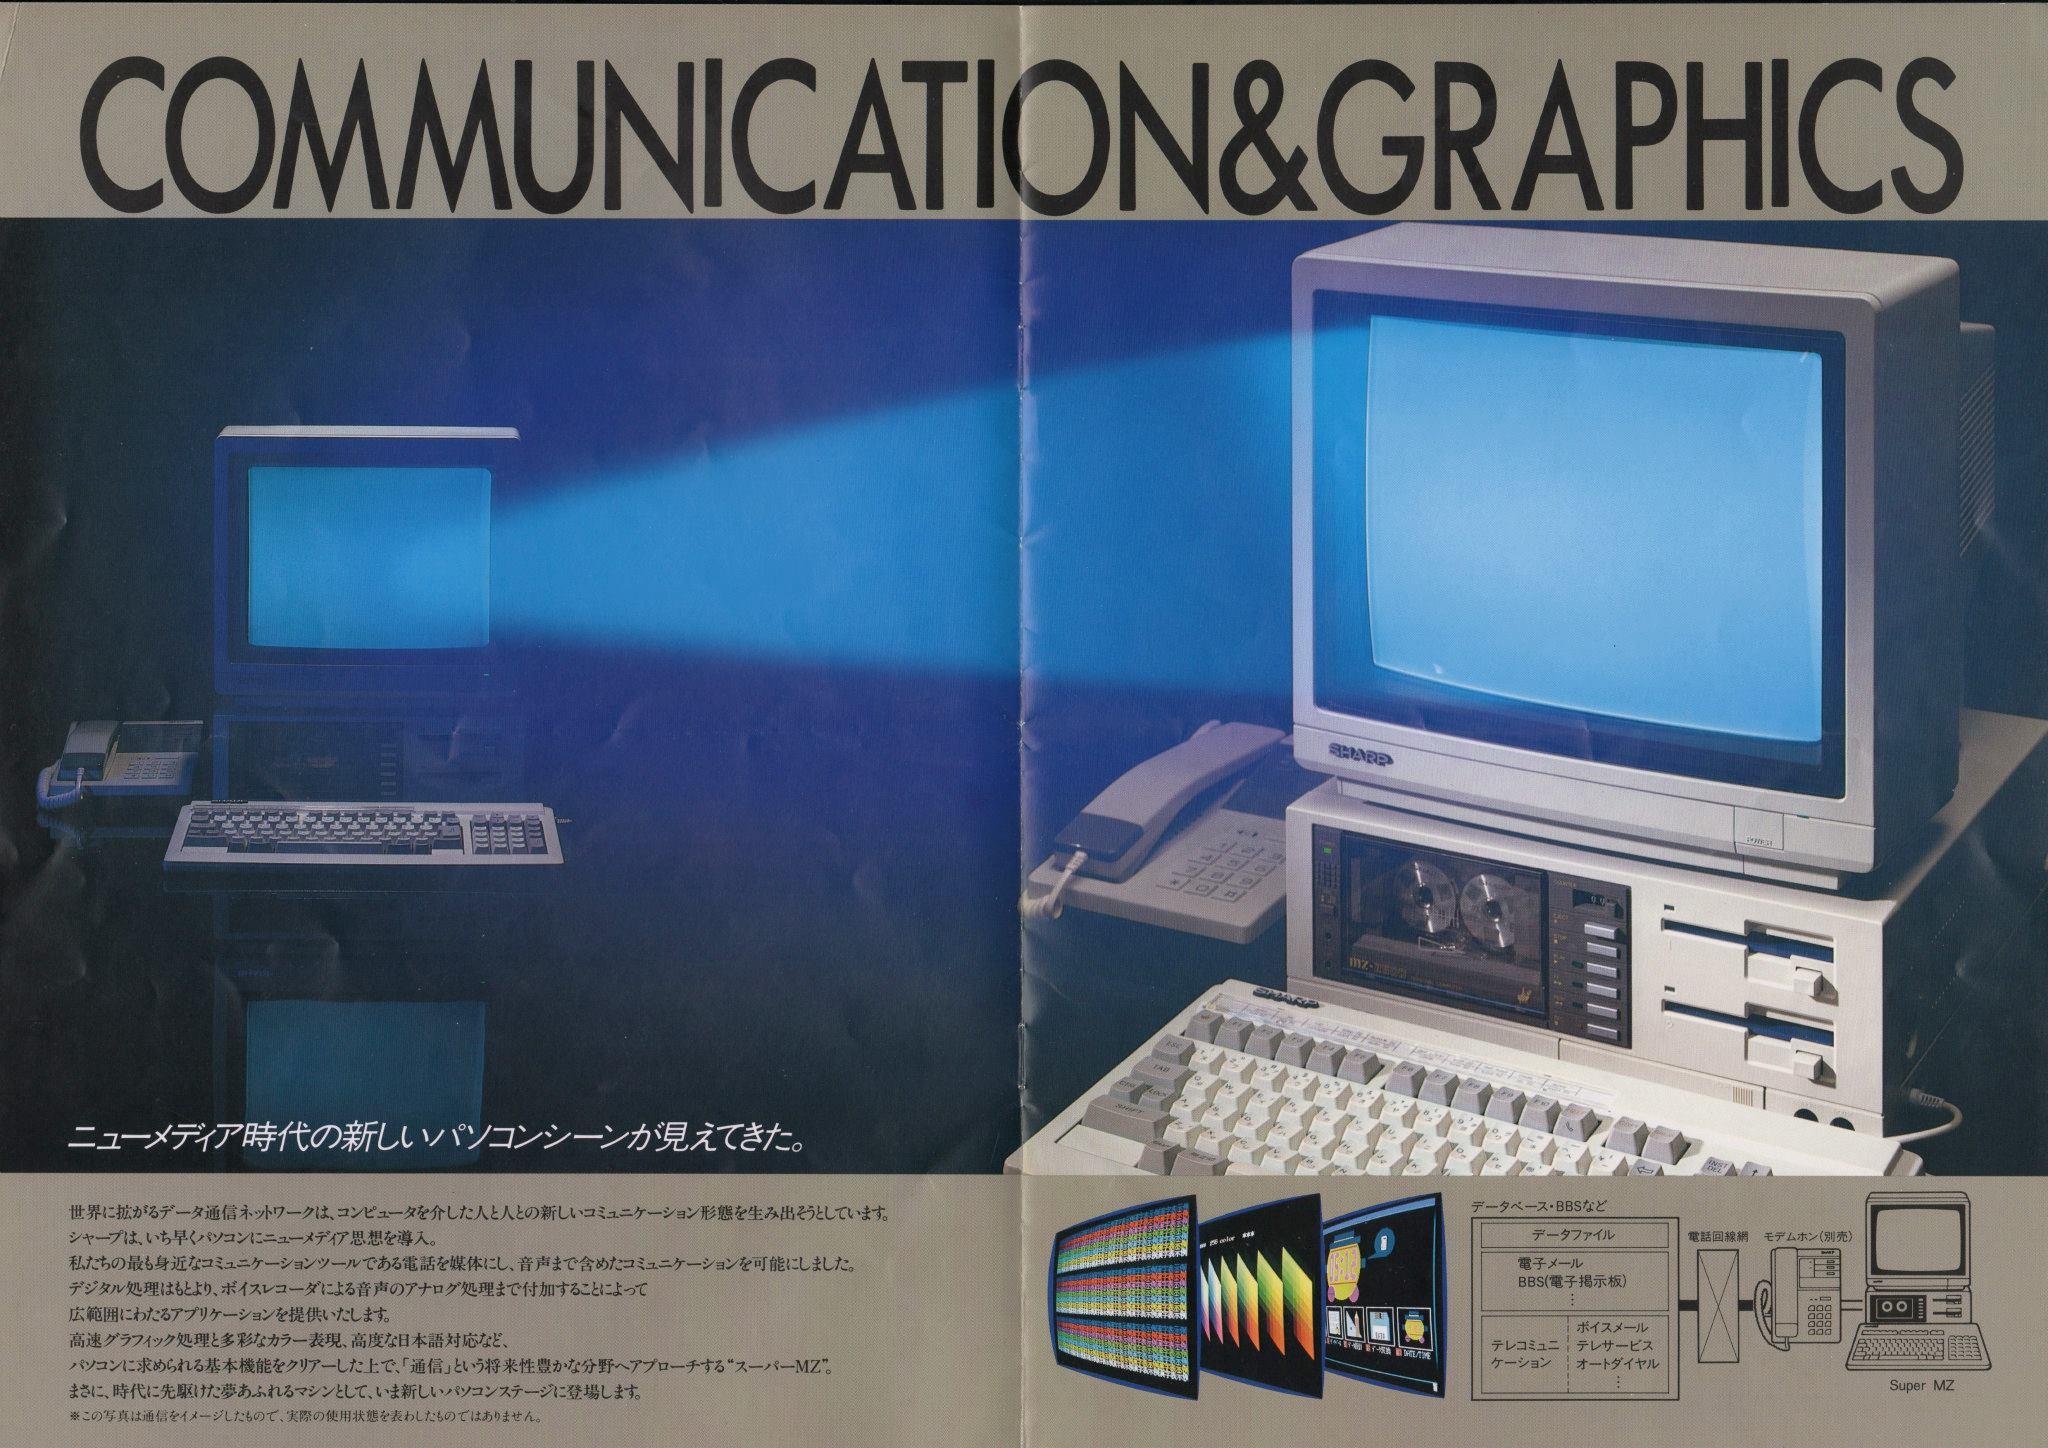 Sharp MZ-2500 (SuperMZ) | nIGHTFALL Blog / RetroComputerMania.com